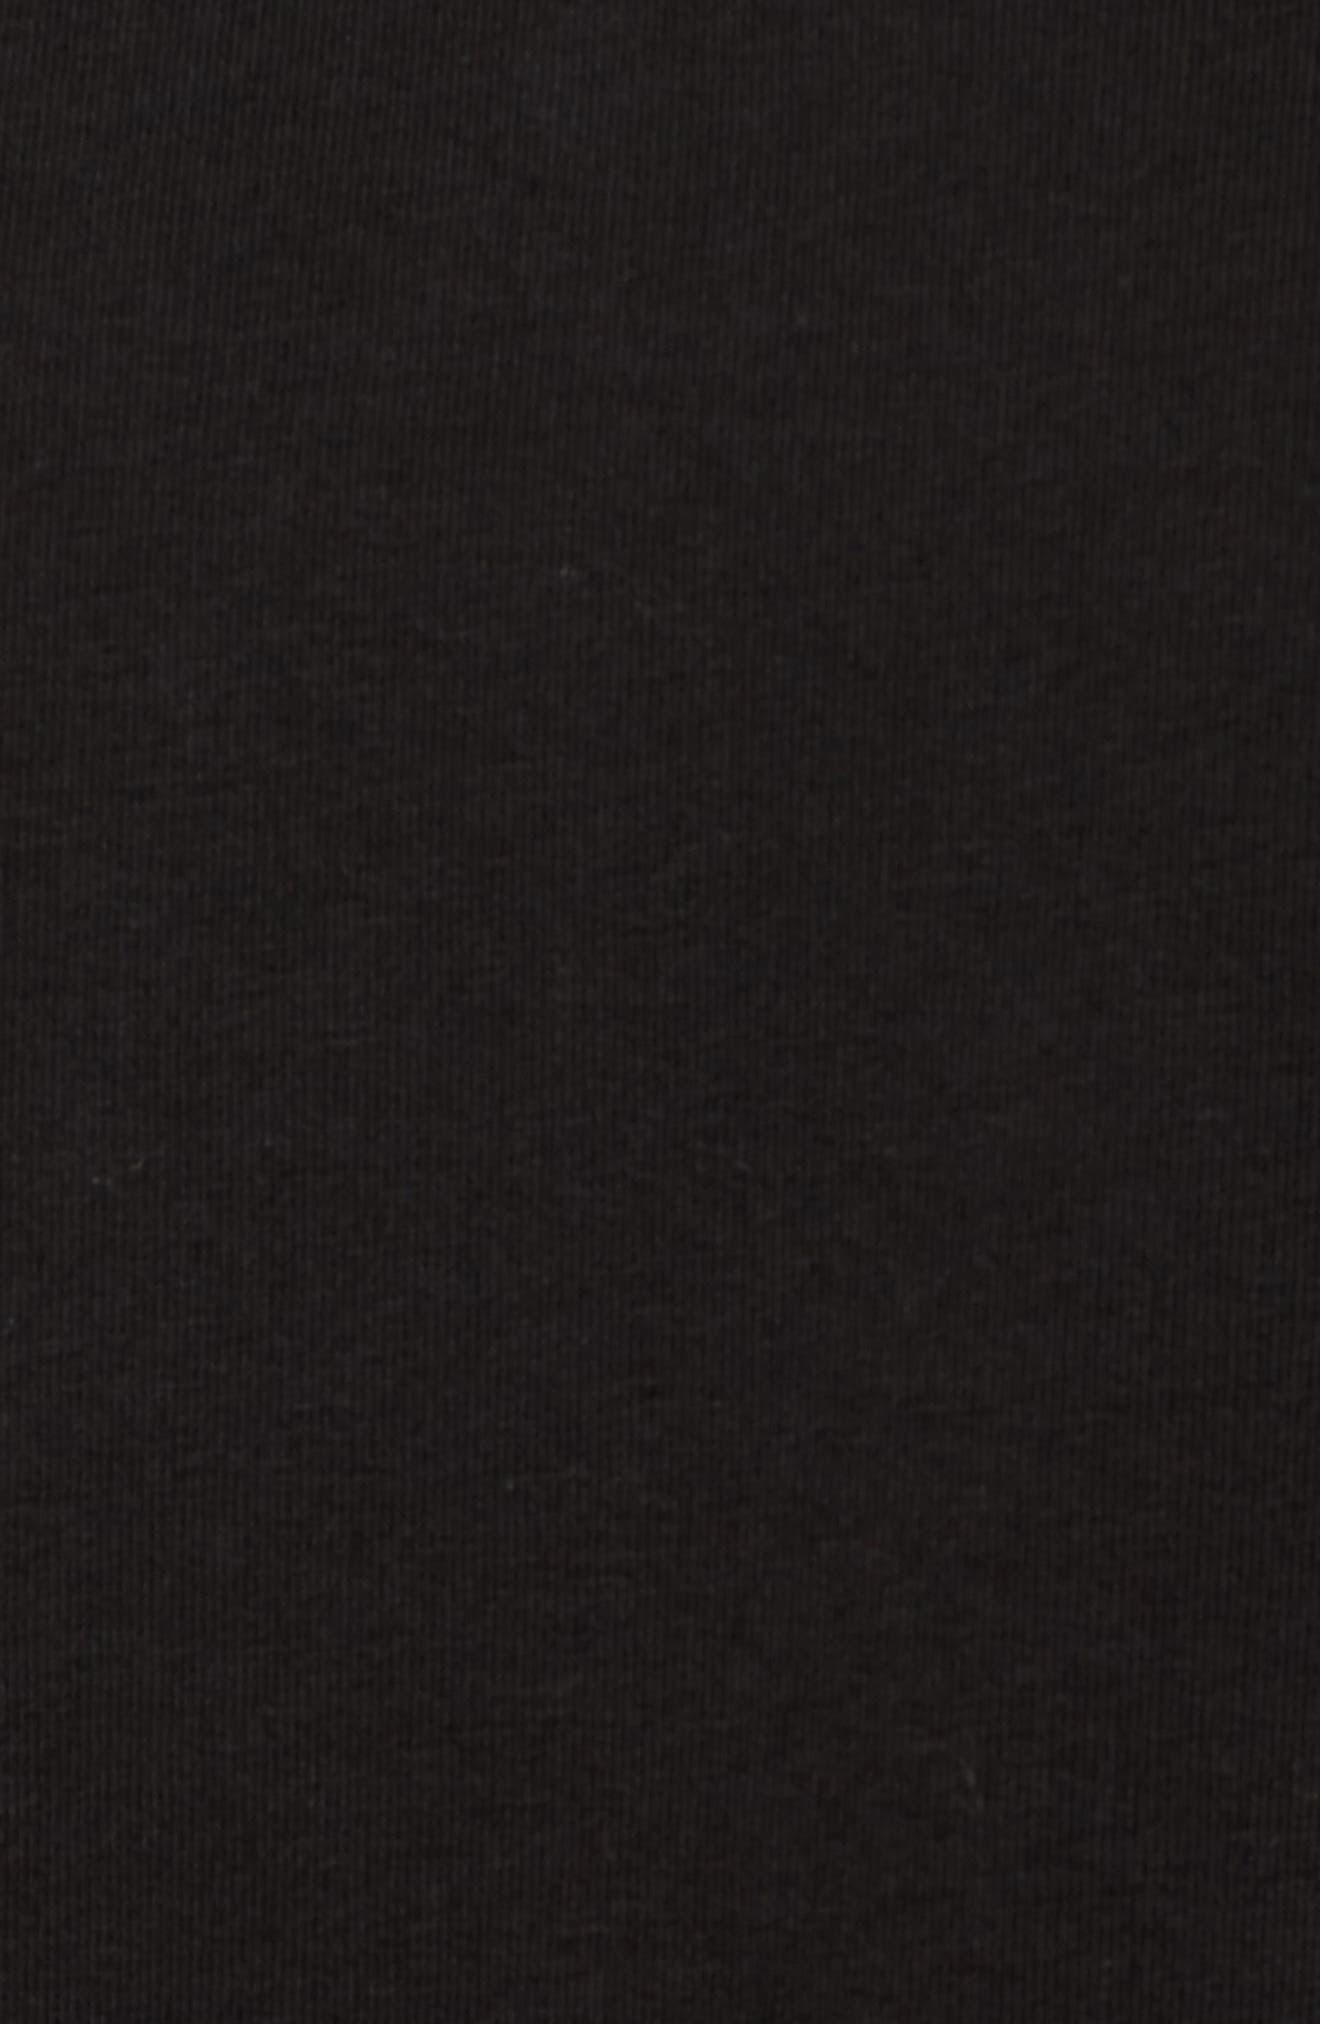 Fleece Panel Sweatshirt,                             Alternate thumbnail 5, color,                             001